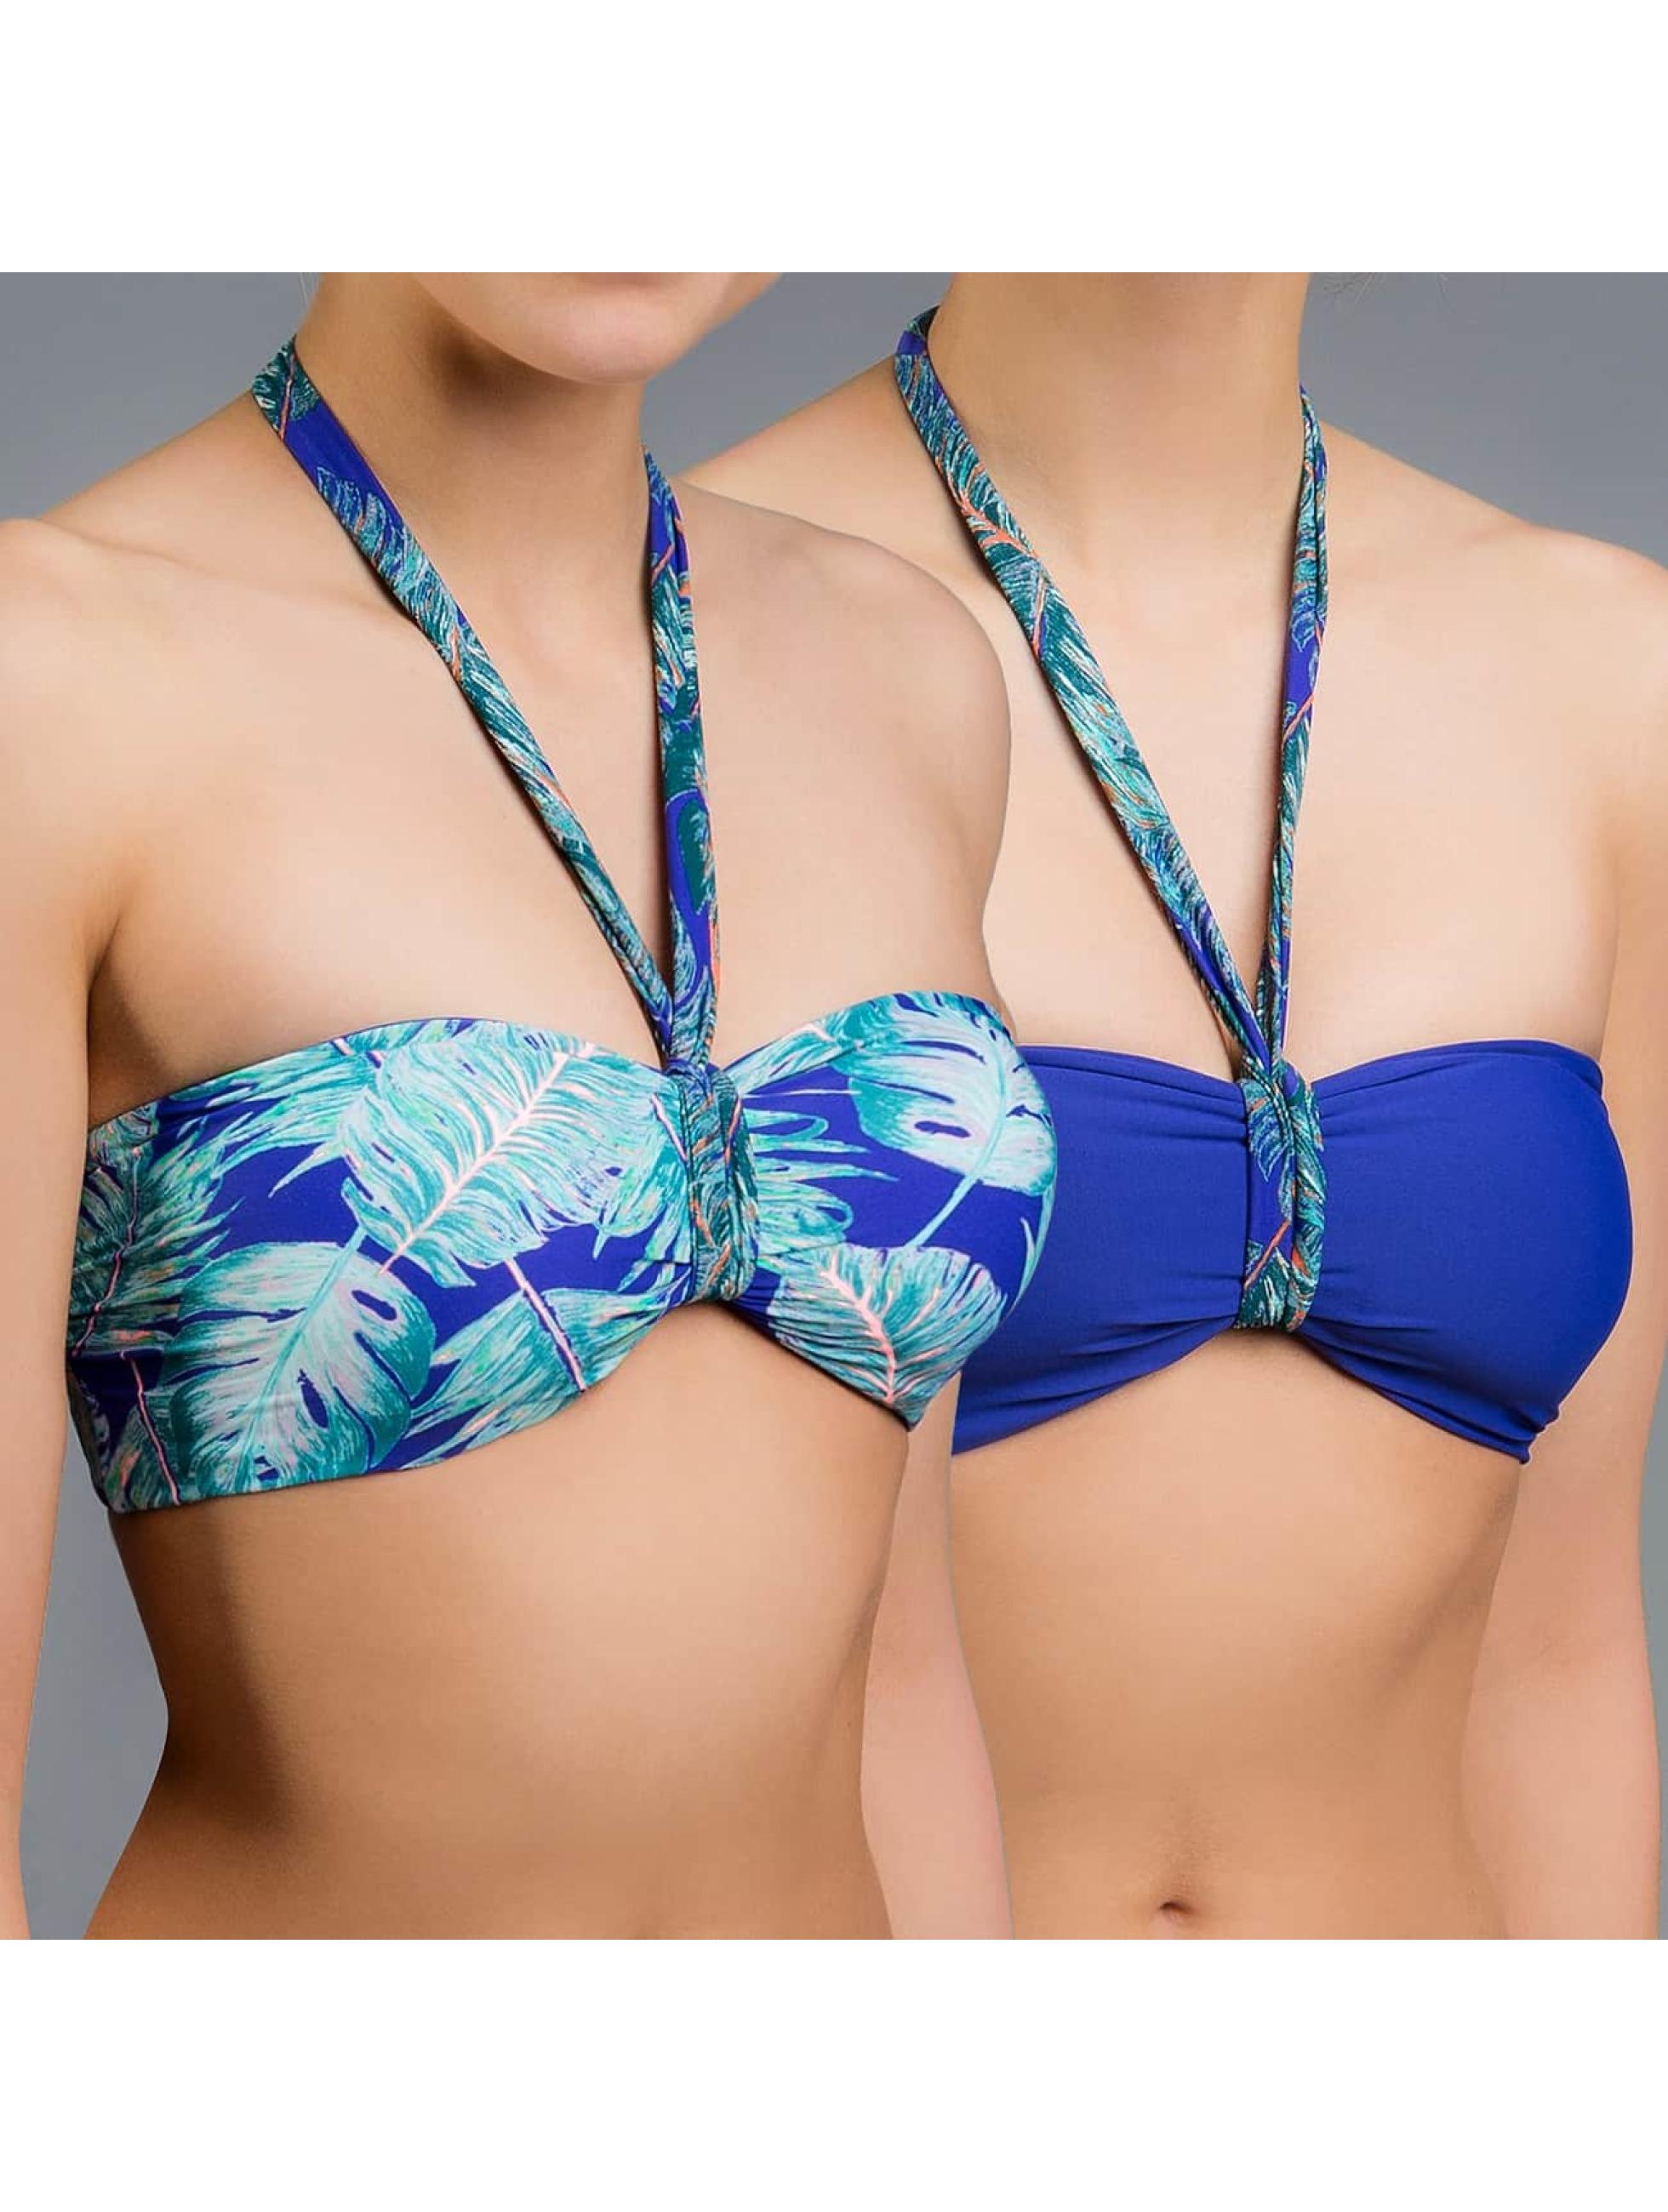 O'NEILL Sous-vêtements / Maillots / Maillot de bain Reversible Bandeau en bleu